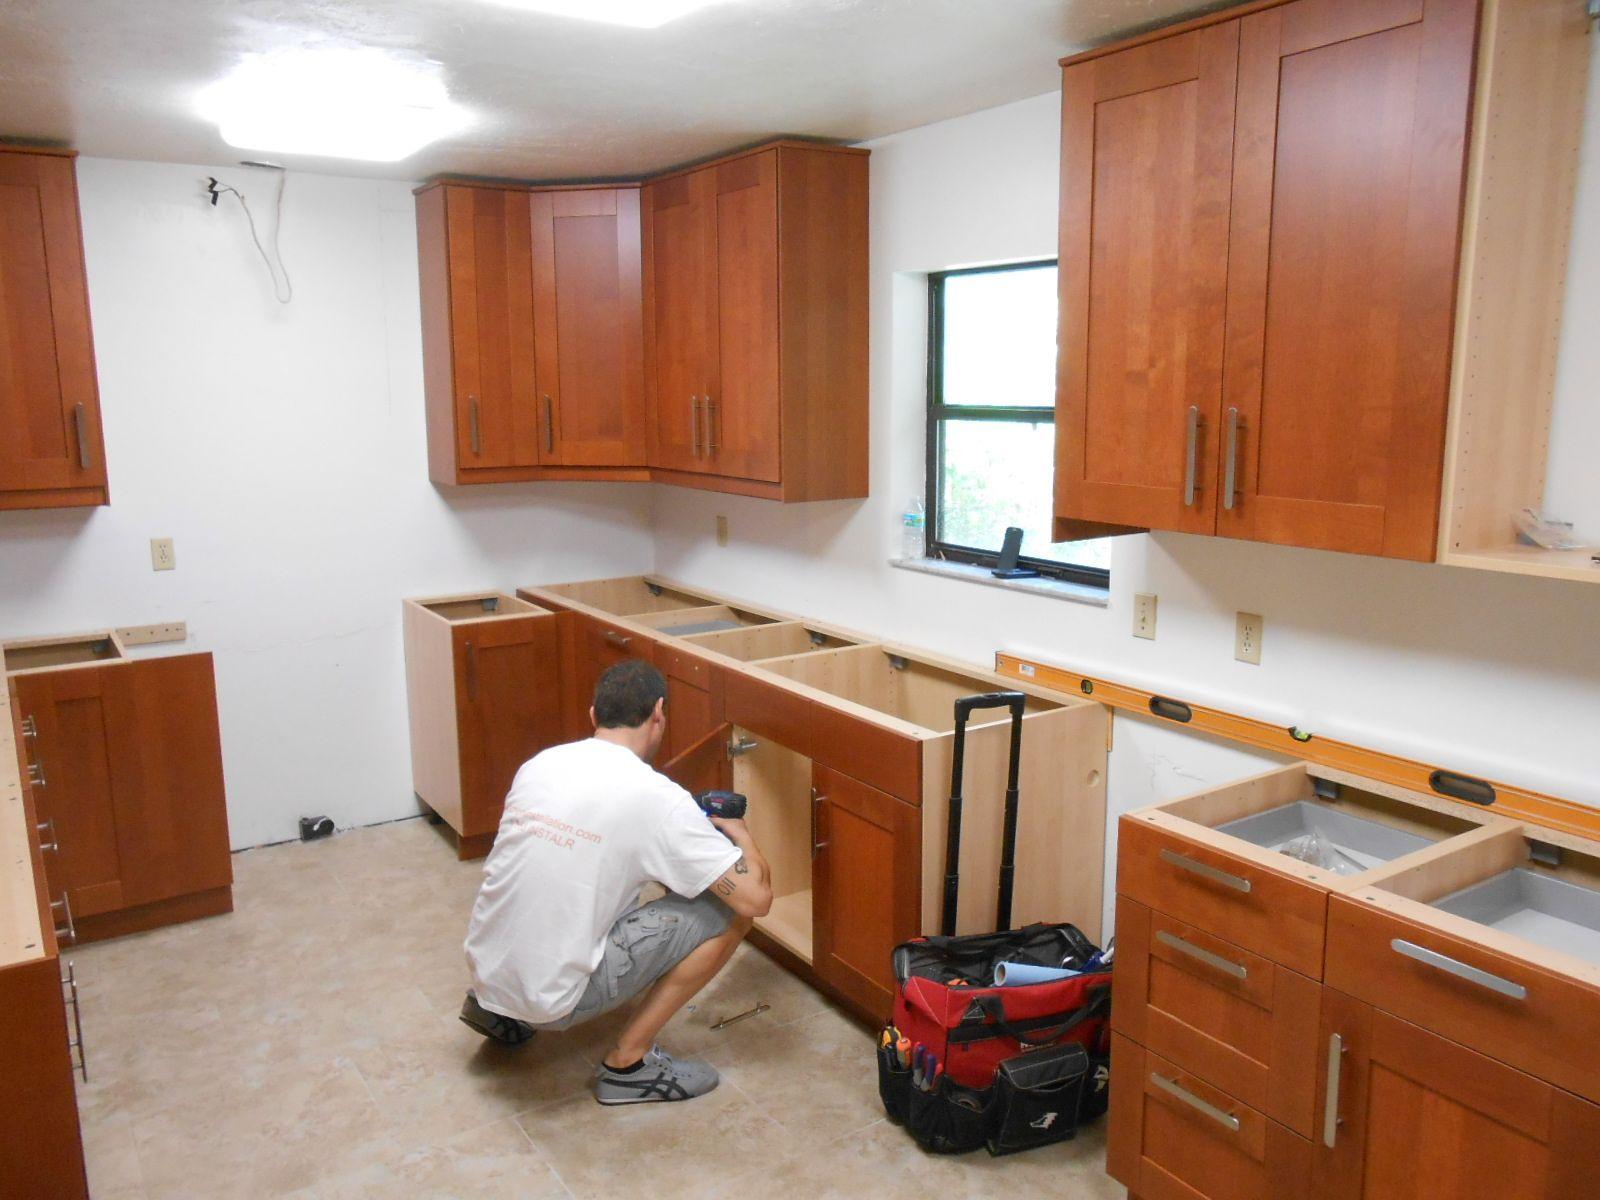 installing ikea kitchen cabinets install kitchen cabinets